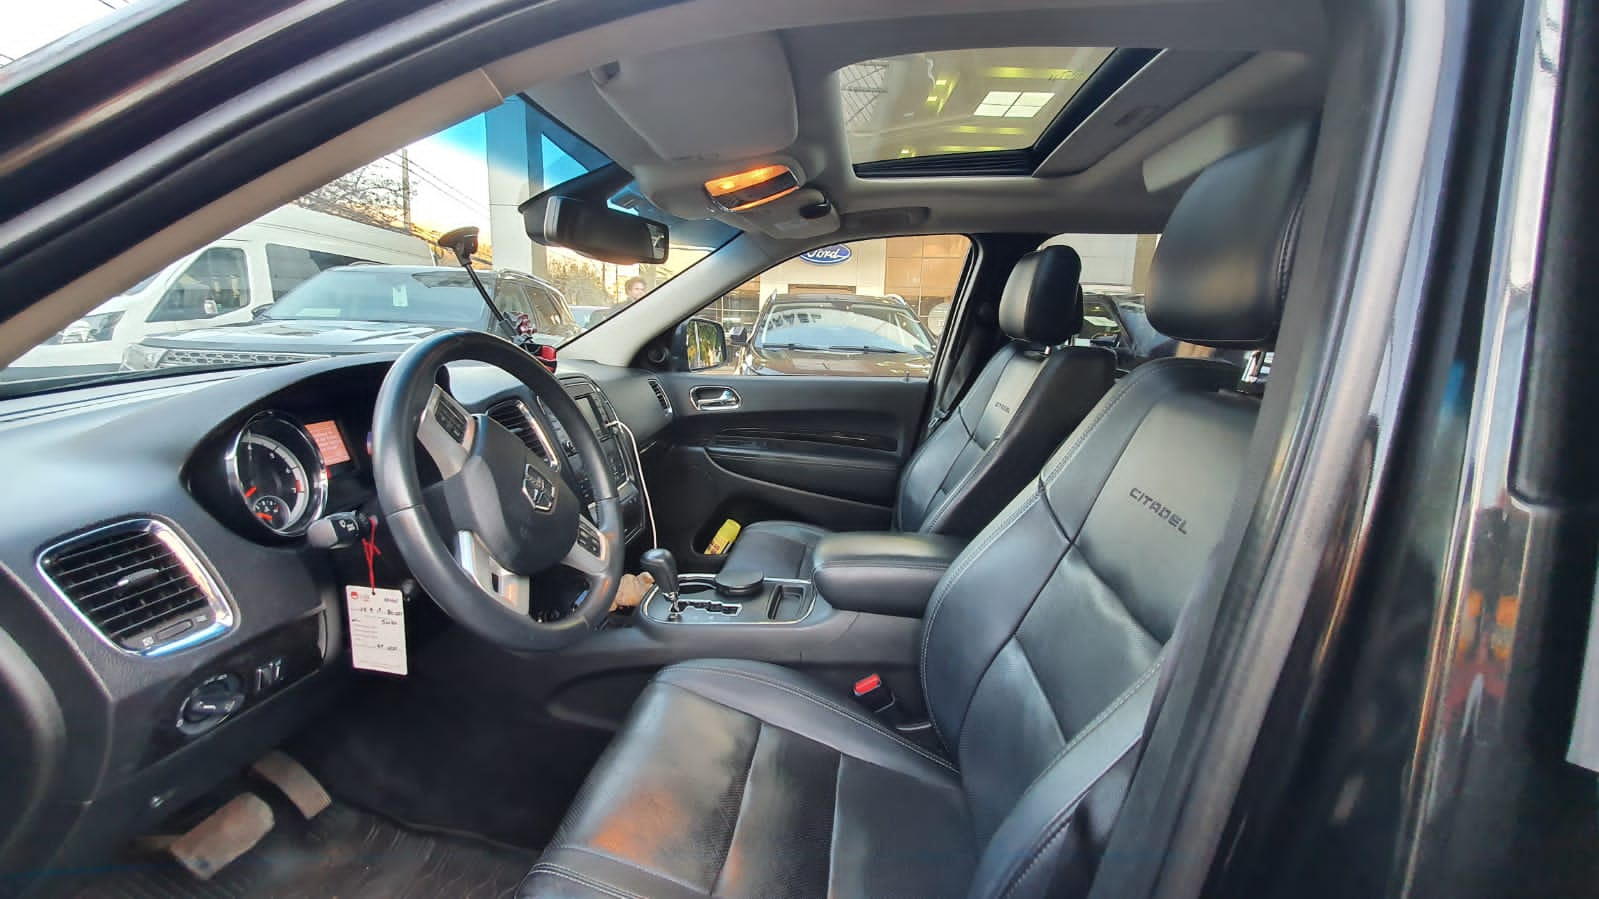 Dodge Durango Citadel 4wd 3,6 autom. Top de línea año 2014